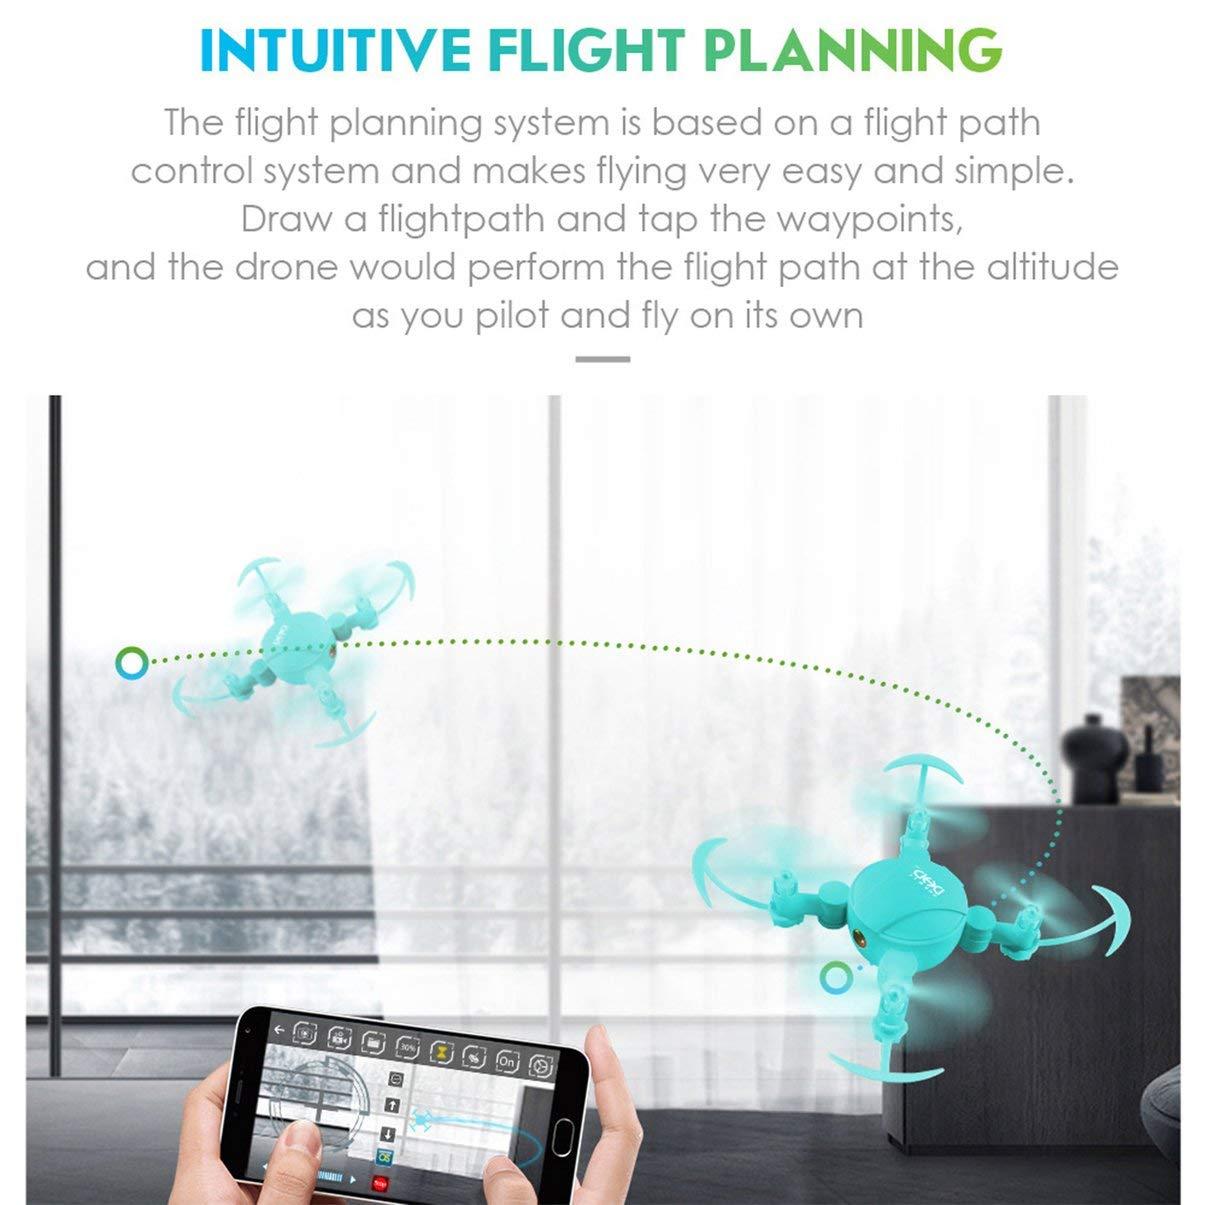 JullyeleDEgant JJRC DHD D4 Rc Hubschrauber Faltbare Mini Drohnen Hd Hd Hd Quadrocopter WiFi Drohne Professionelle Selfie Drone Mit 720P Kamera 5e43f4